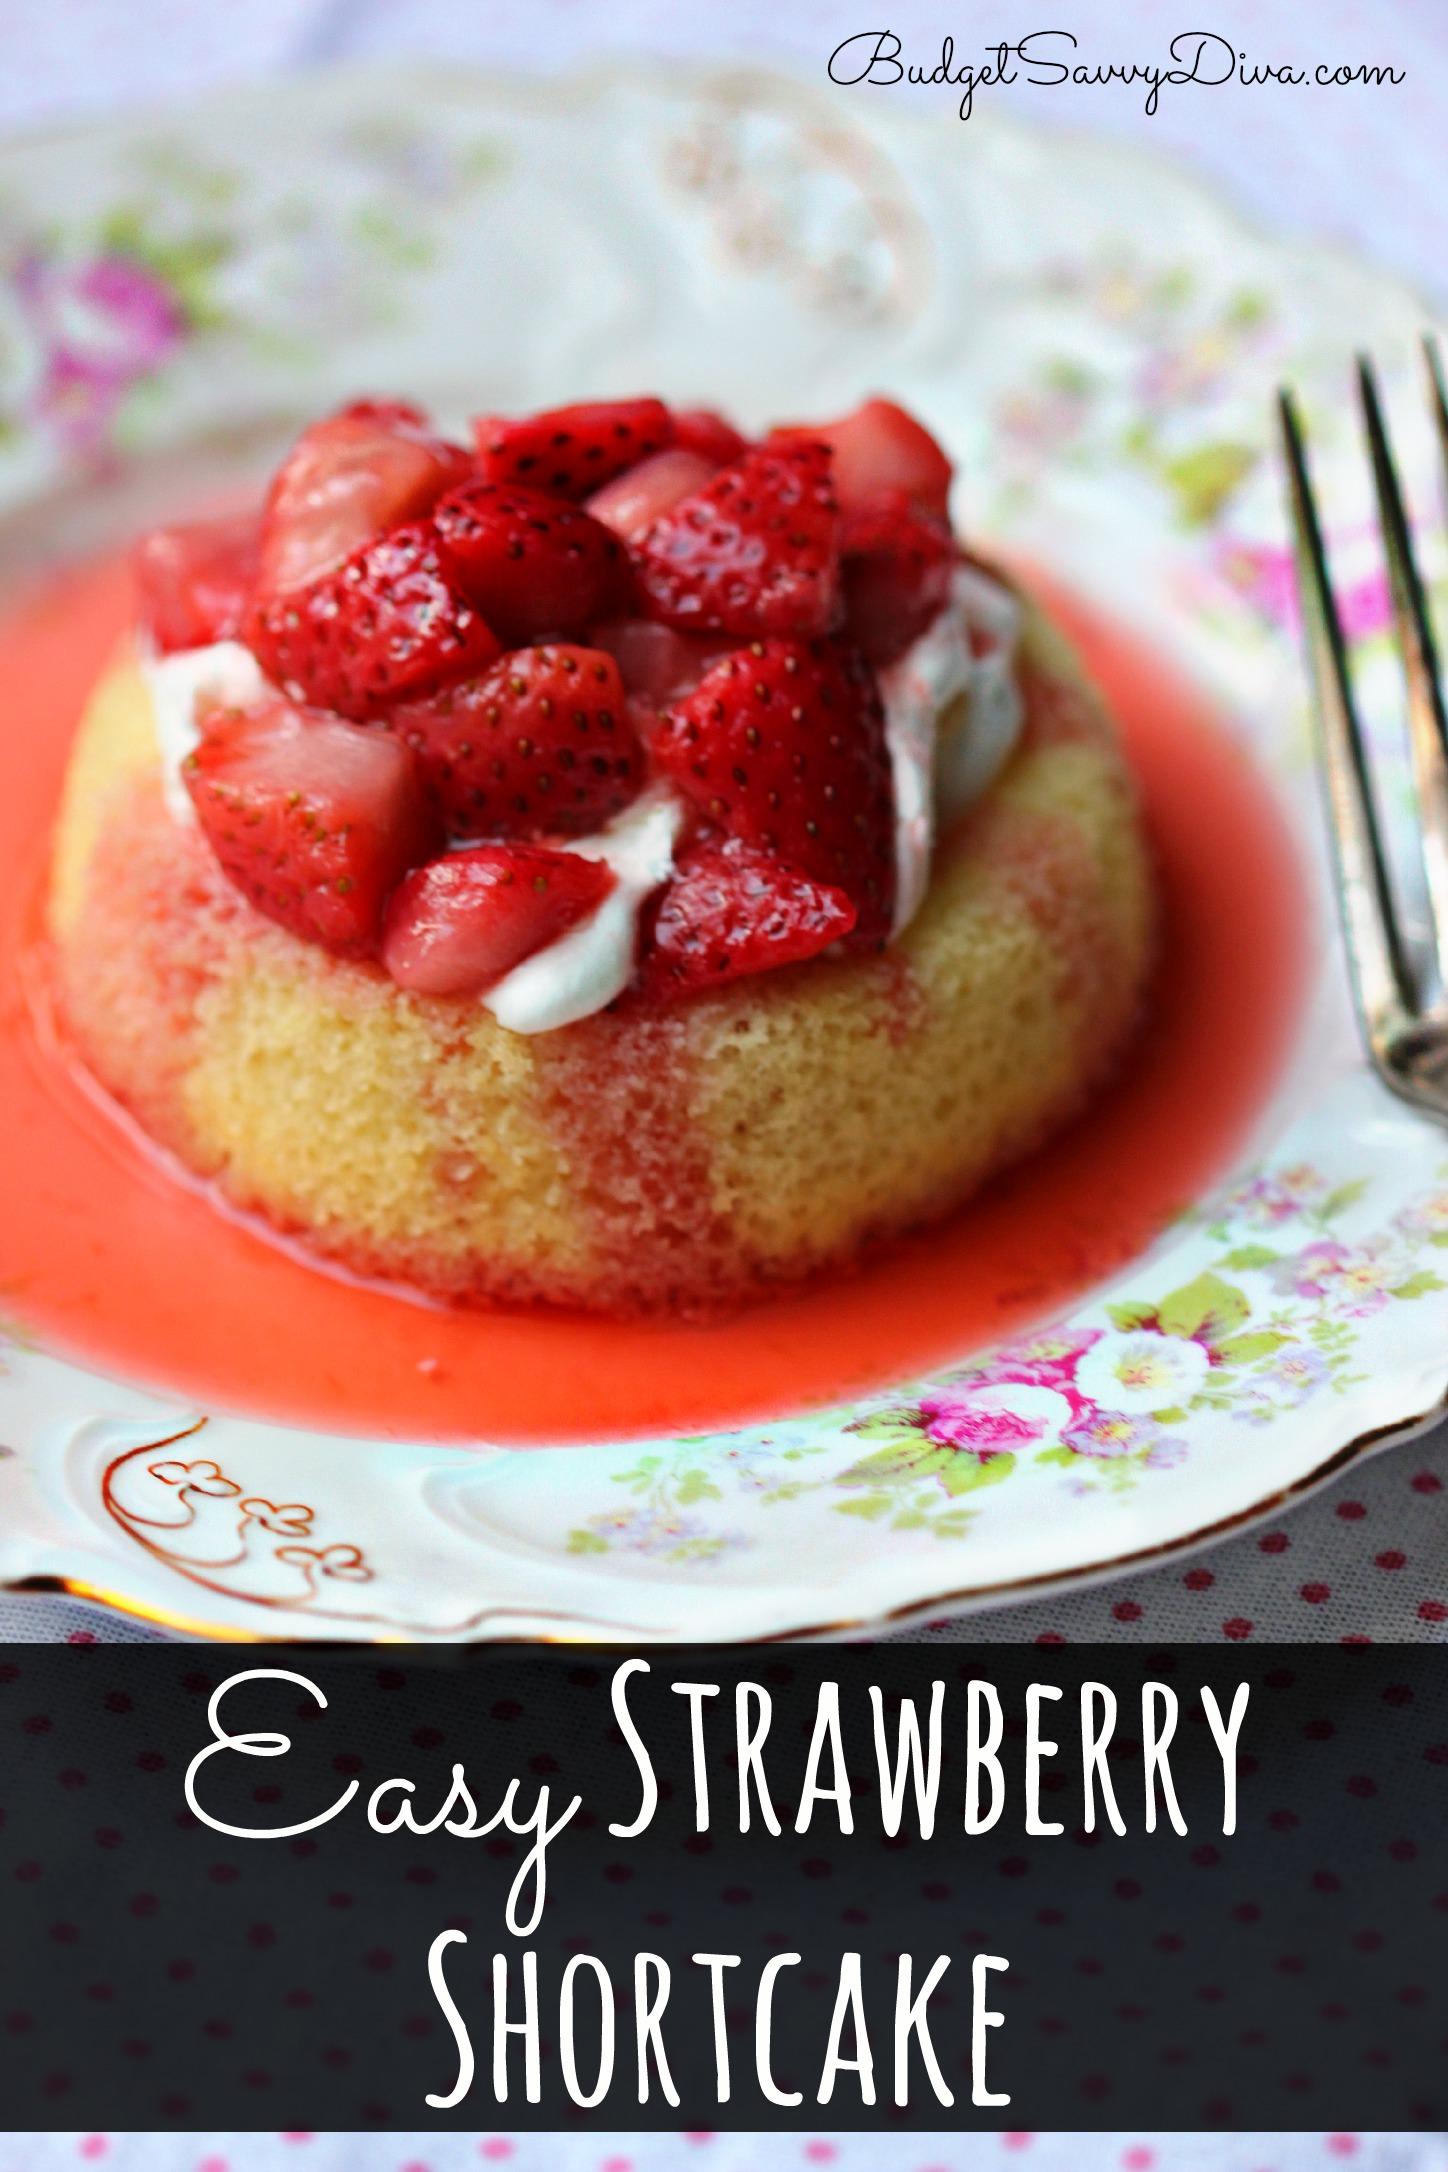 Easy Strawberry Shortcake Recipe | Budget Savvy Diva